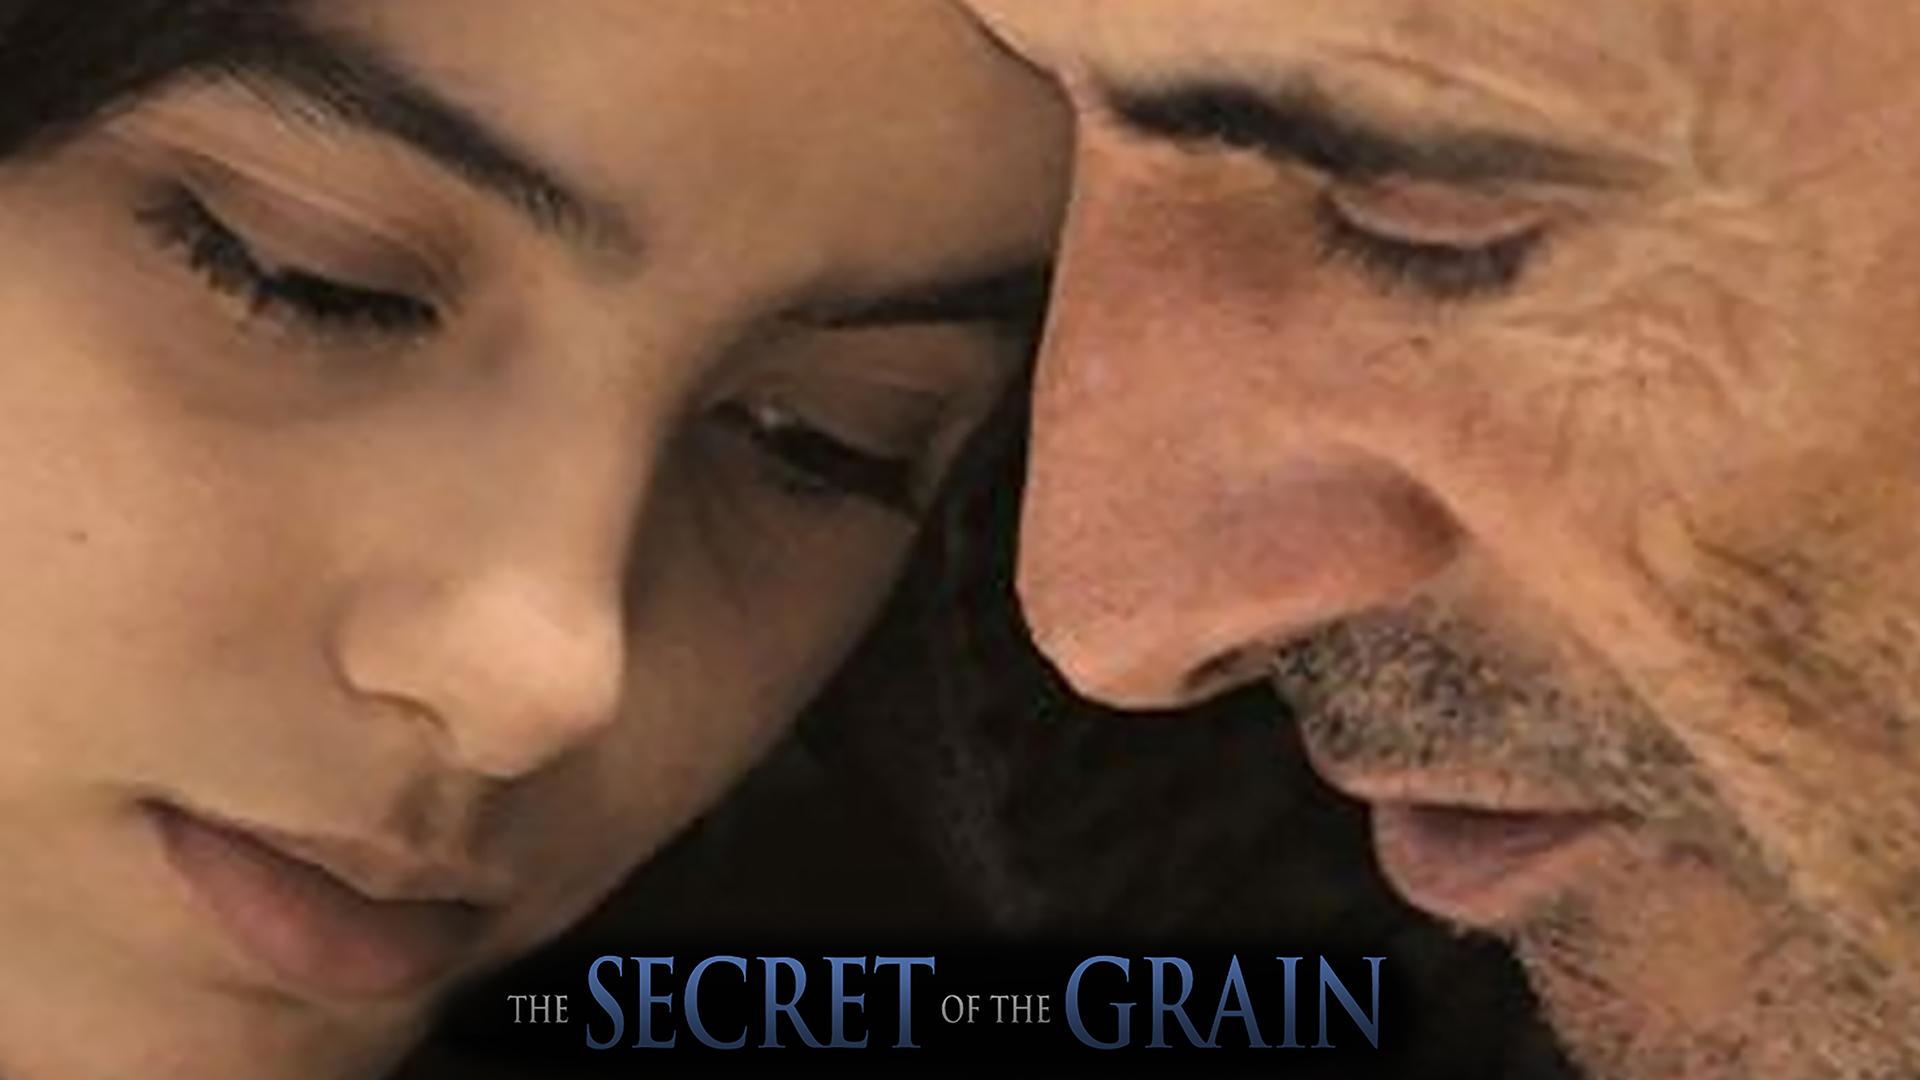 The Secret of the Grain (English Subtitled)